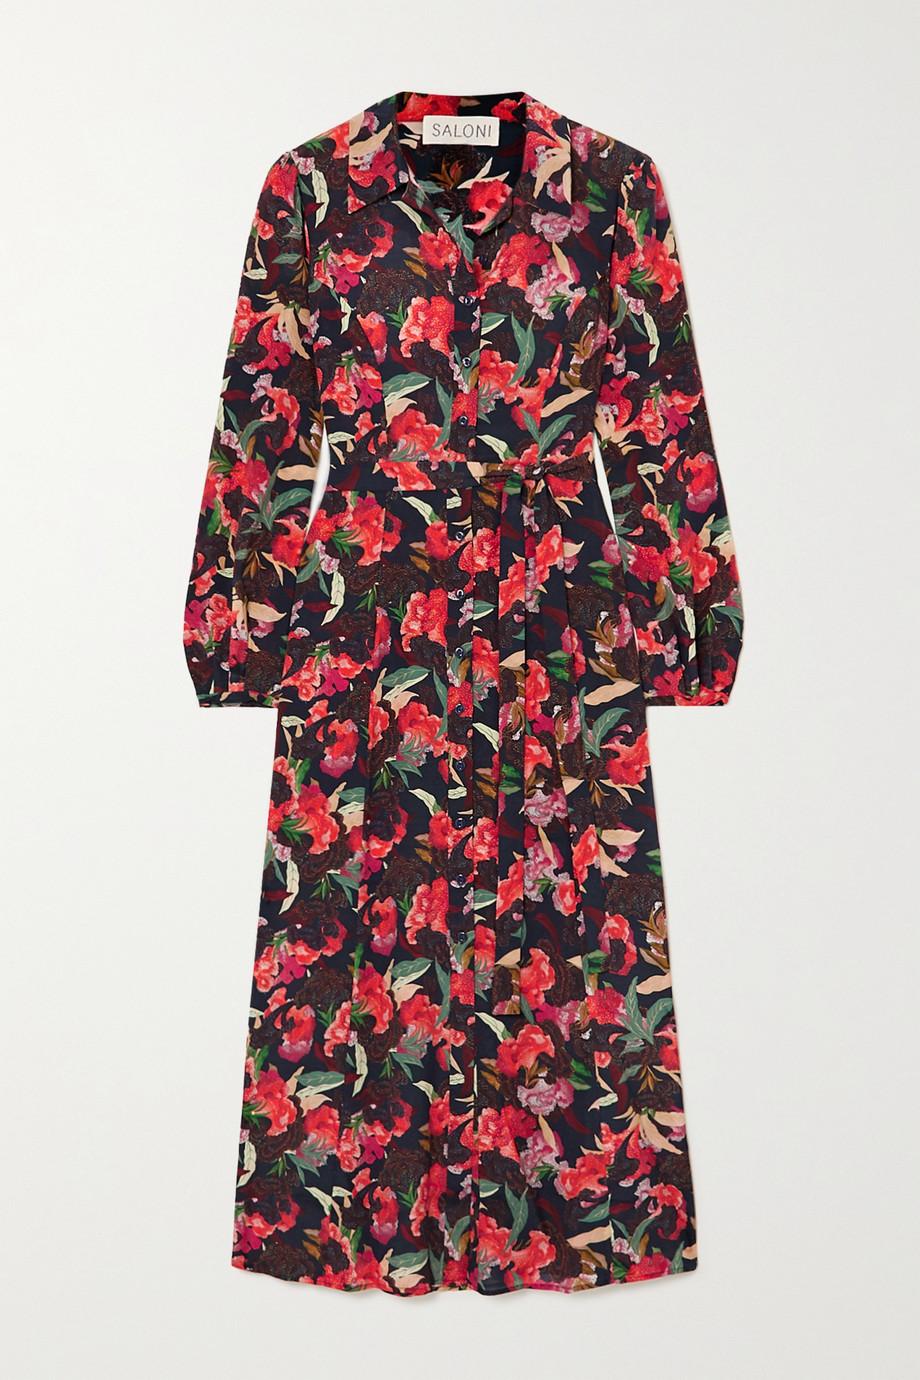 Saloni Vanessa-B floral-print silk crepe de chine shirt dress